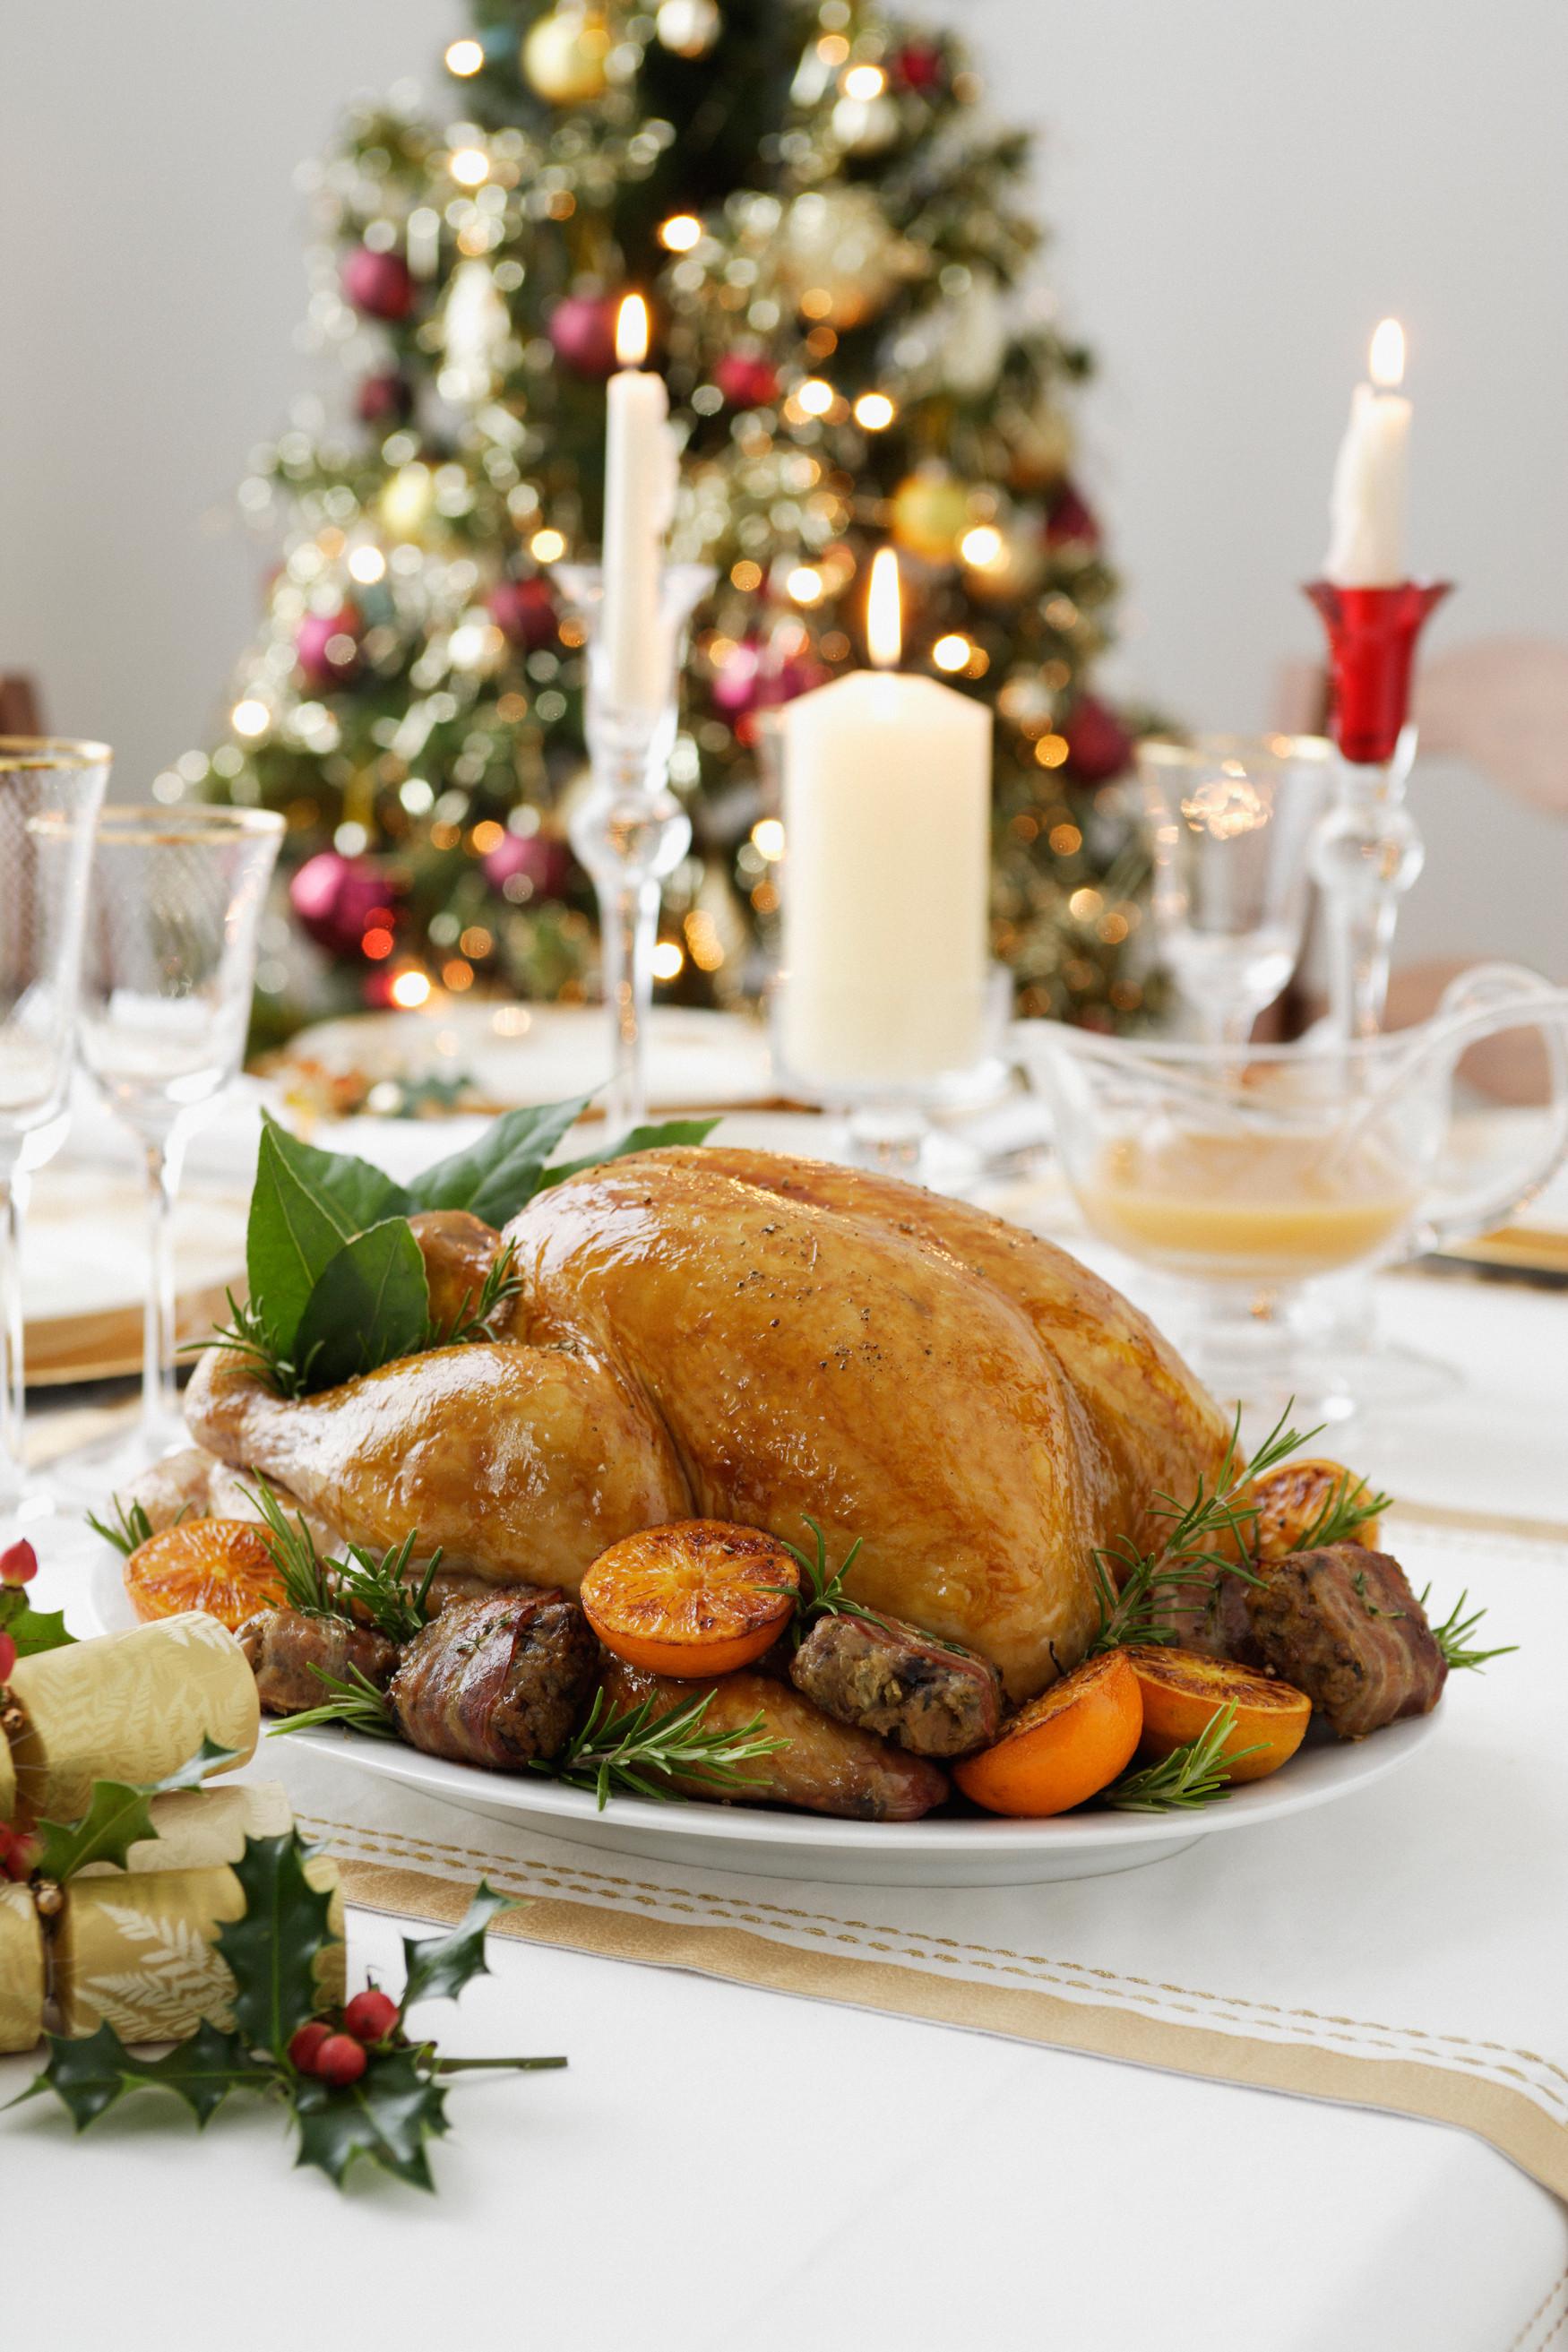 Easy Christmas Dinner  5 Easy Christmas Dinner Menu Ideas plete Christmas Dinner Menus Country Living